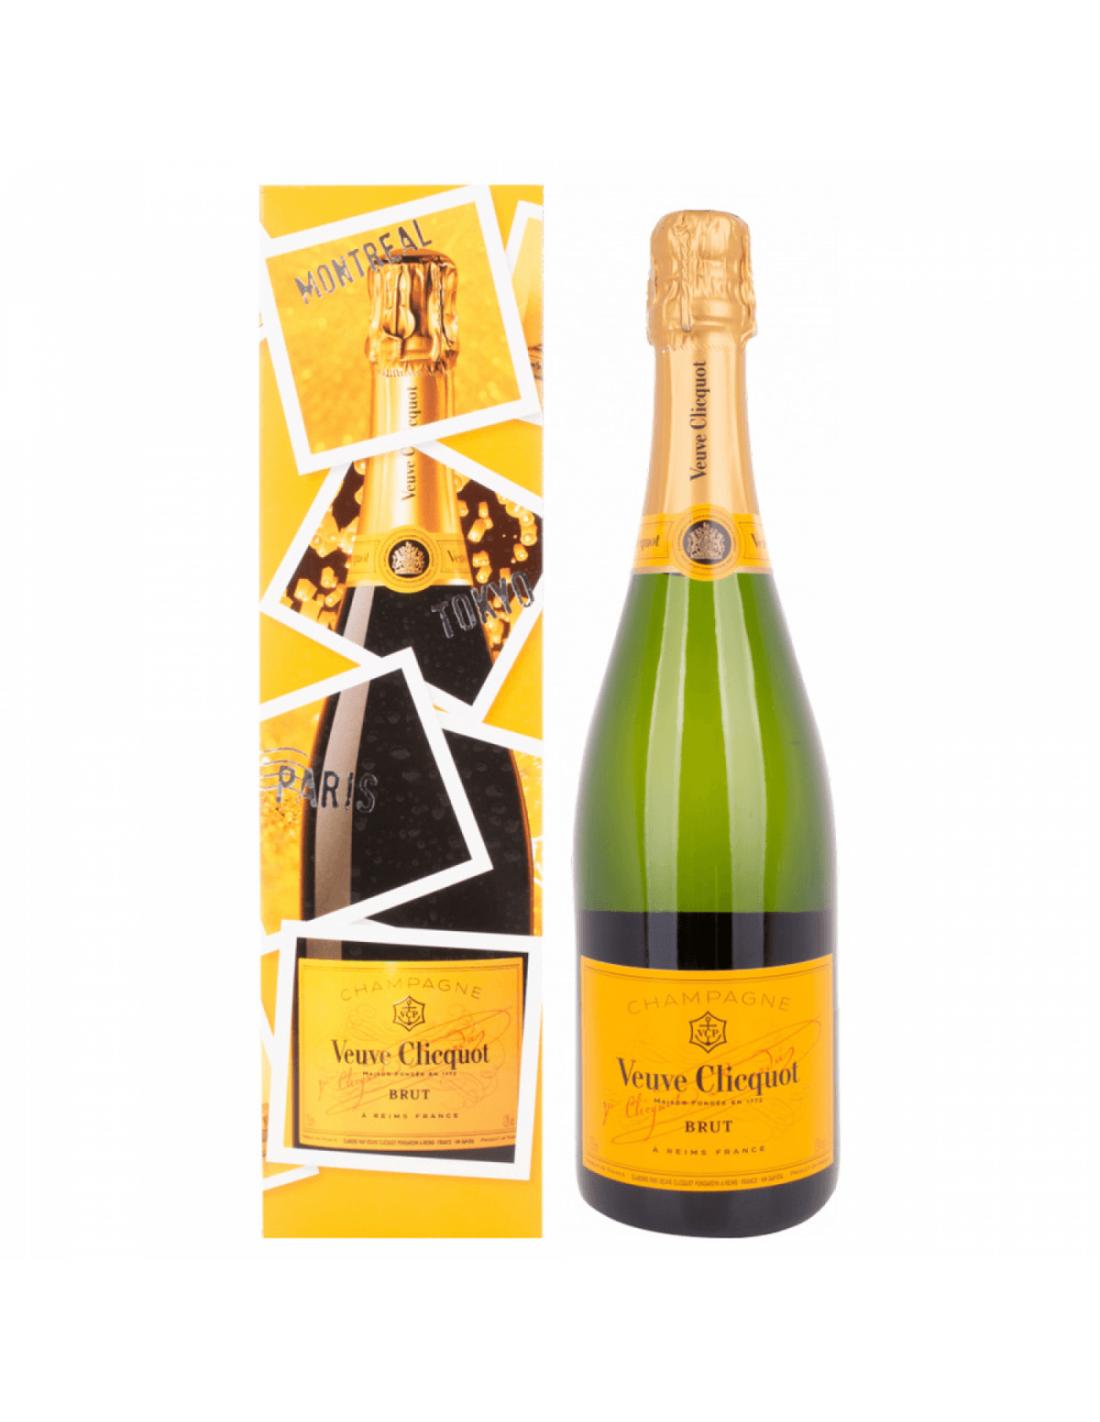 Sampanie Veuve Clicquot Brut Eoy Edition Champagne, 12% alc., 0.75L, Franta